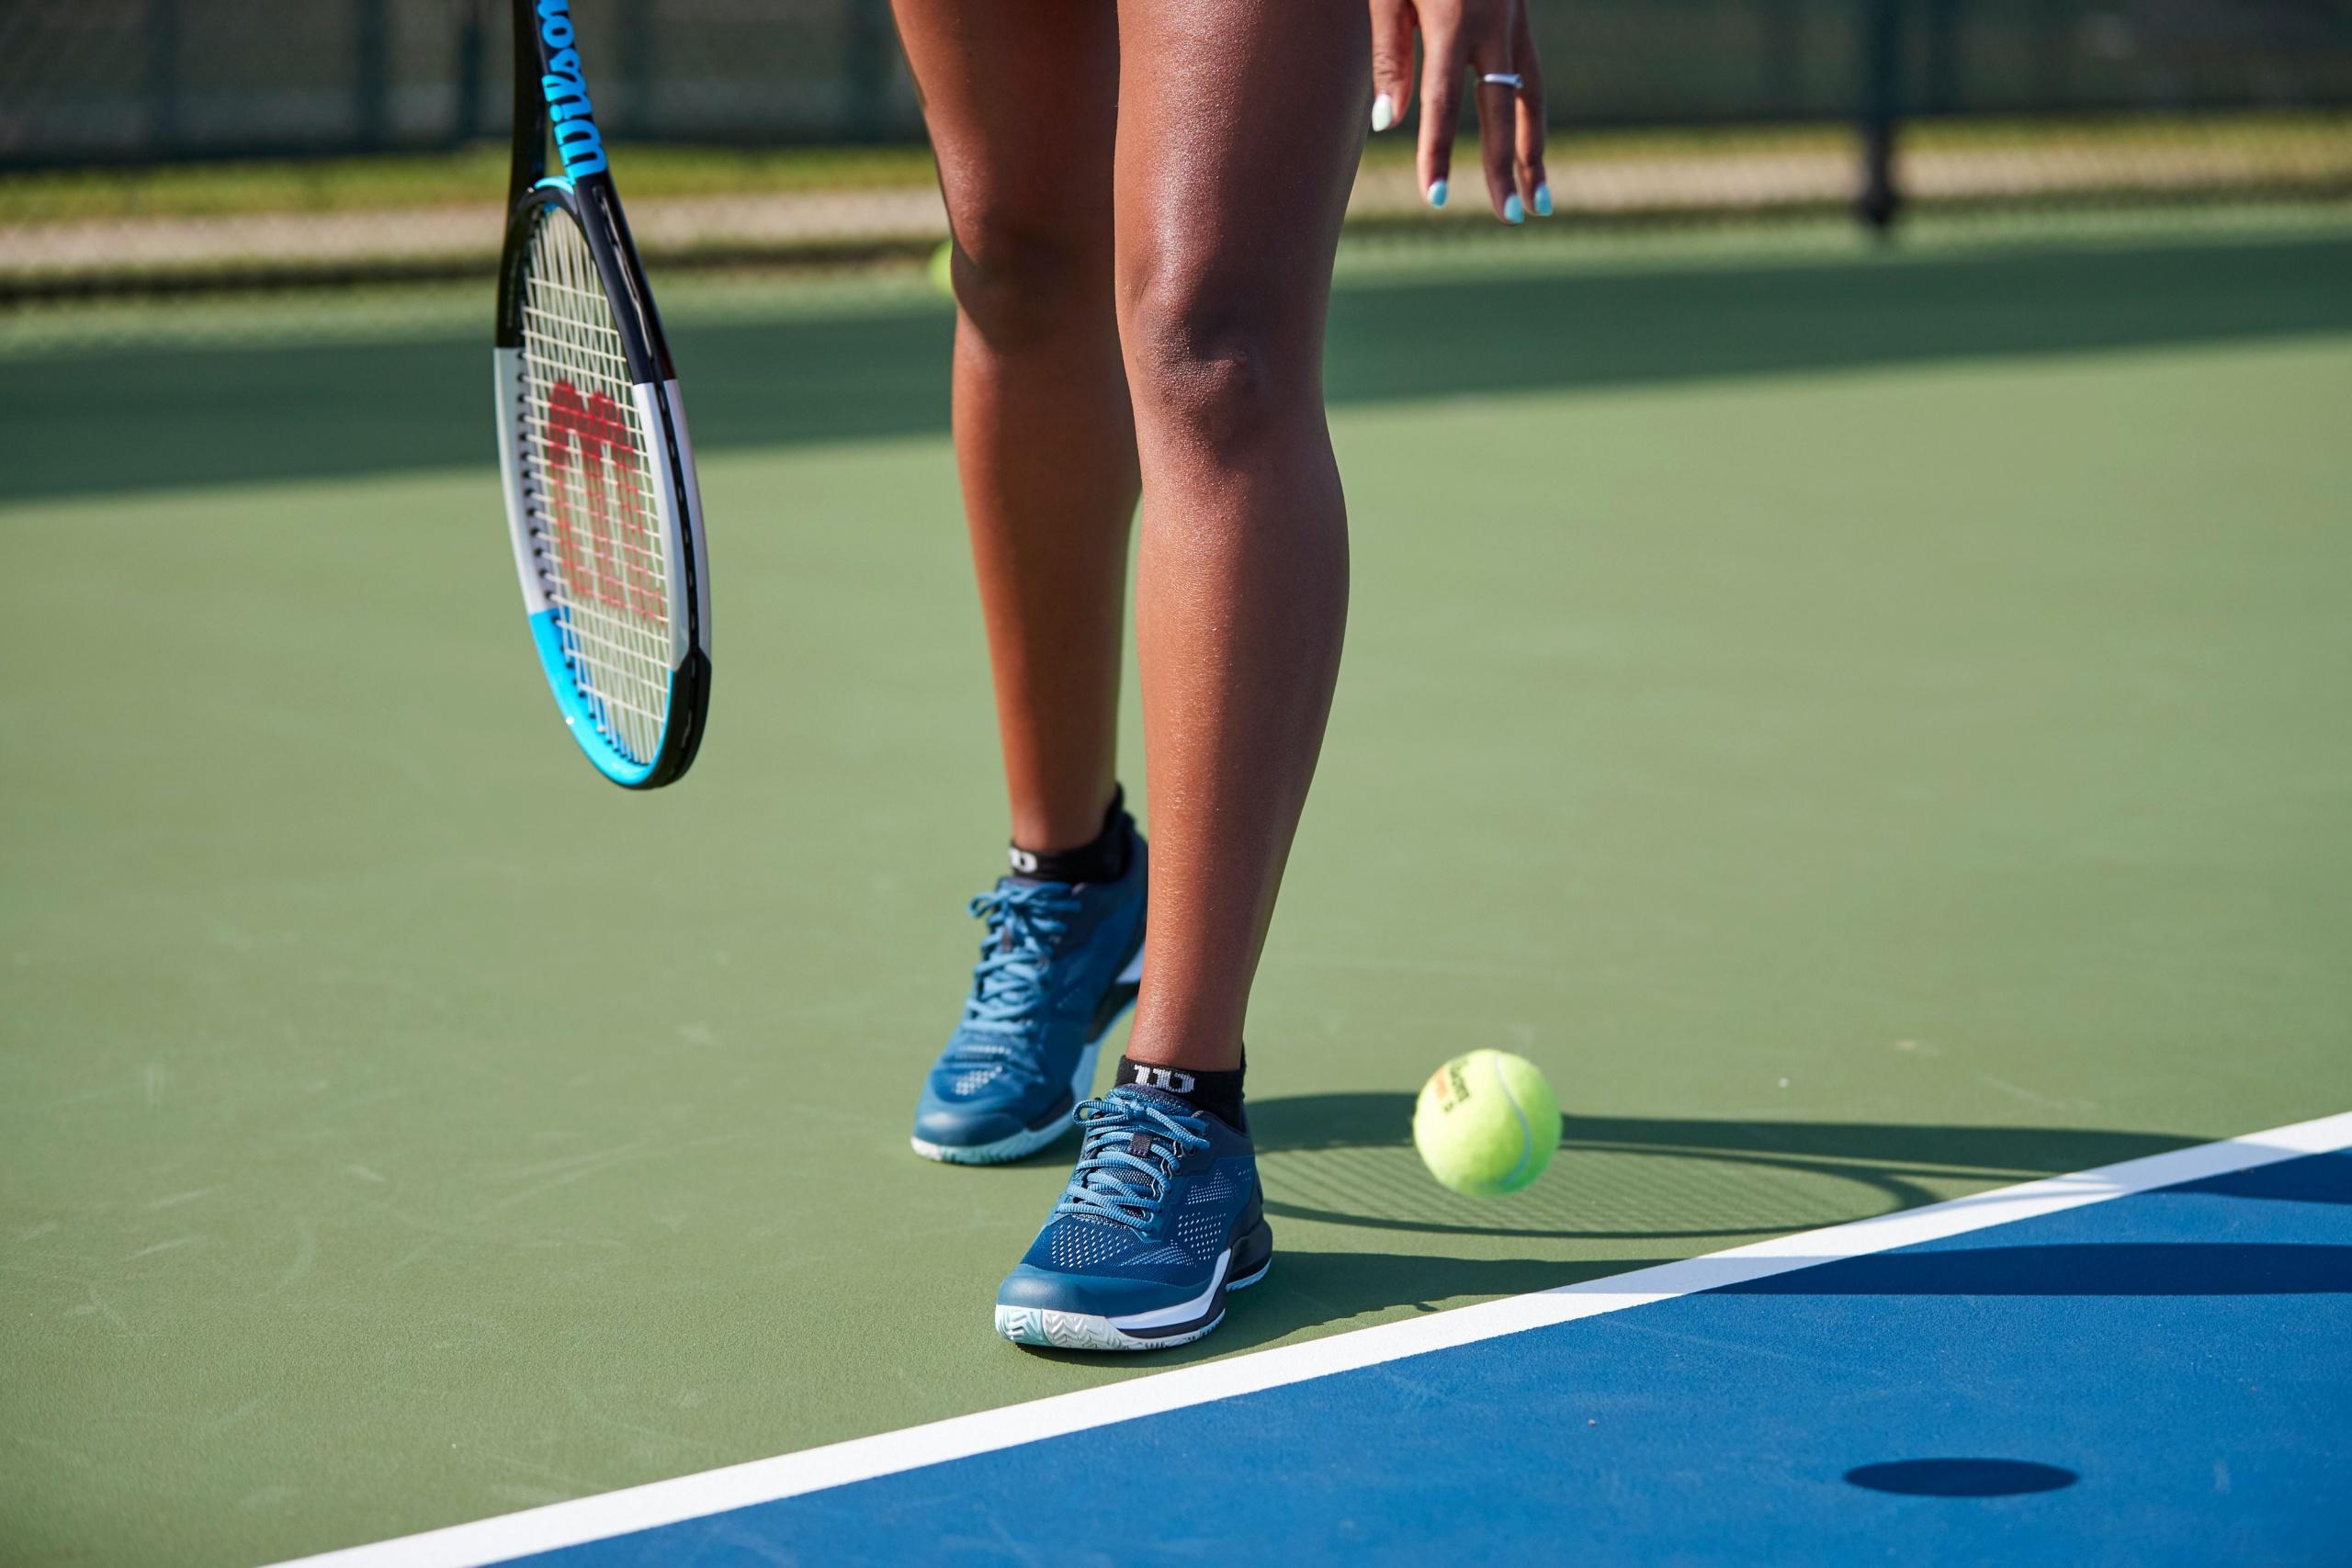 French Open – Final Recap